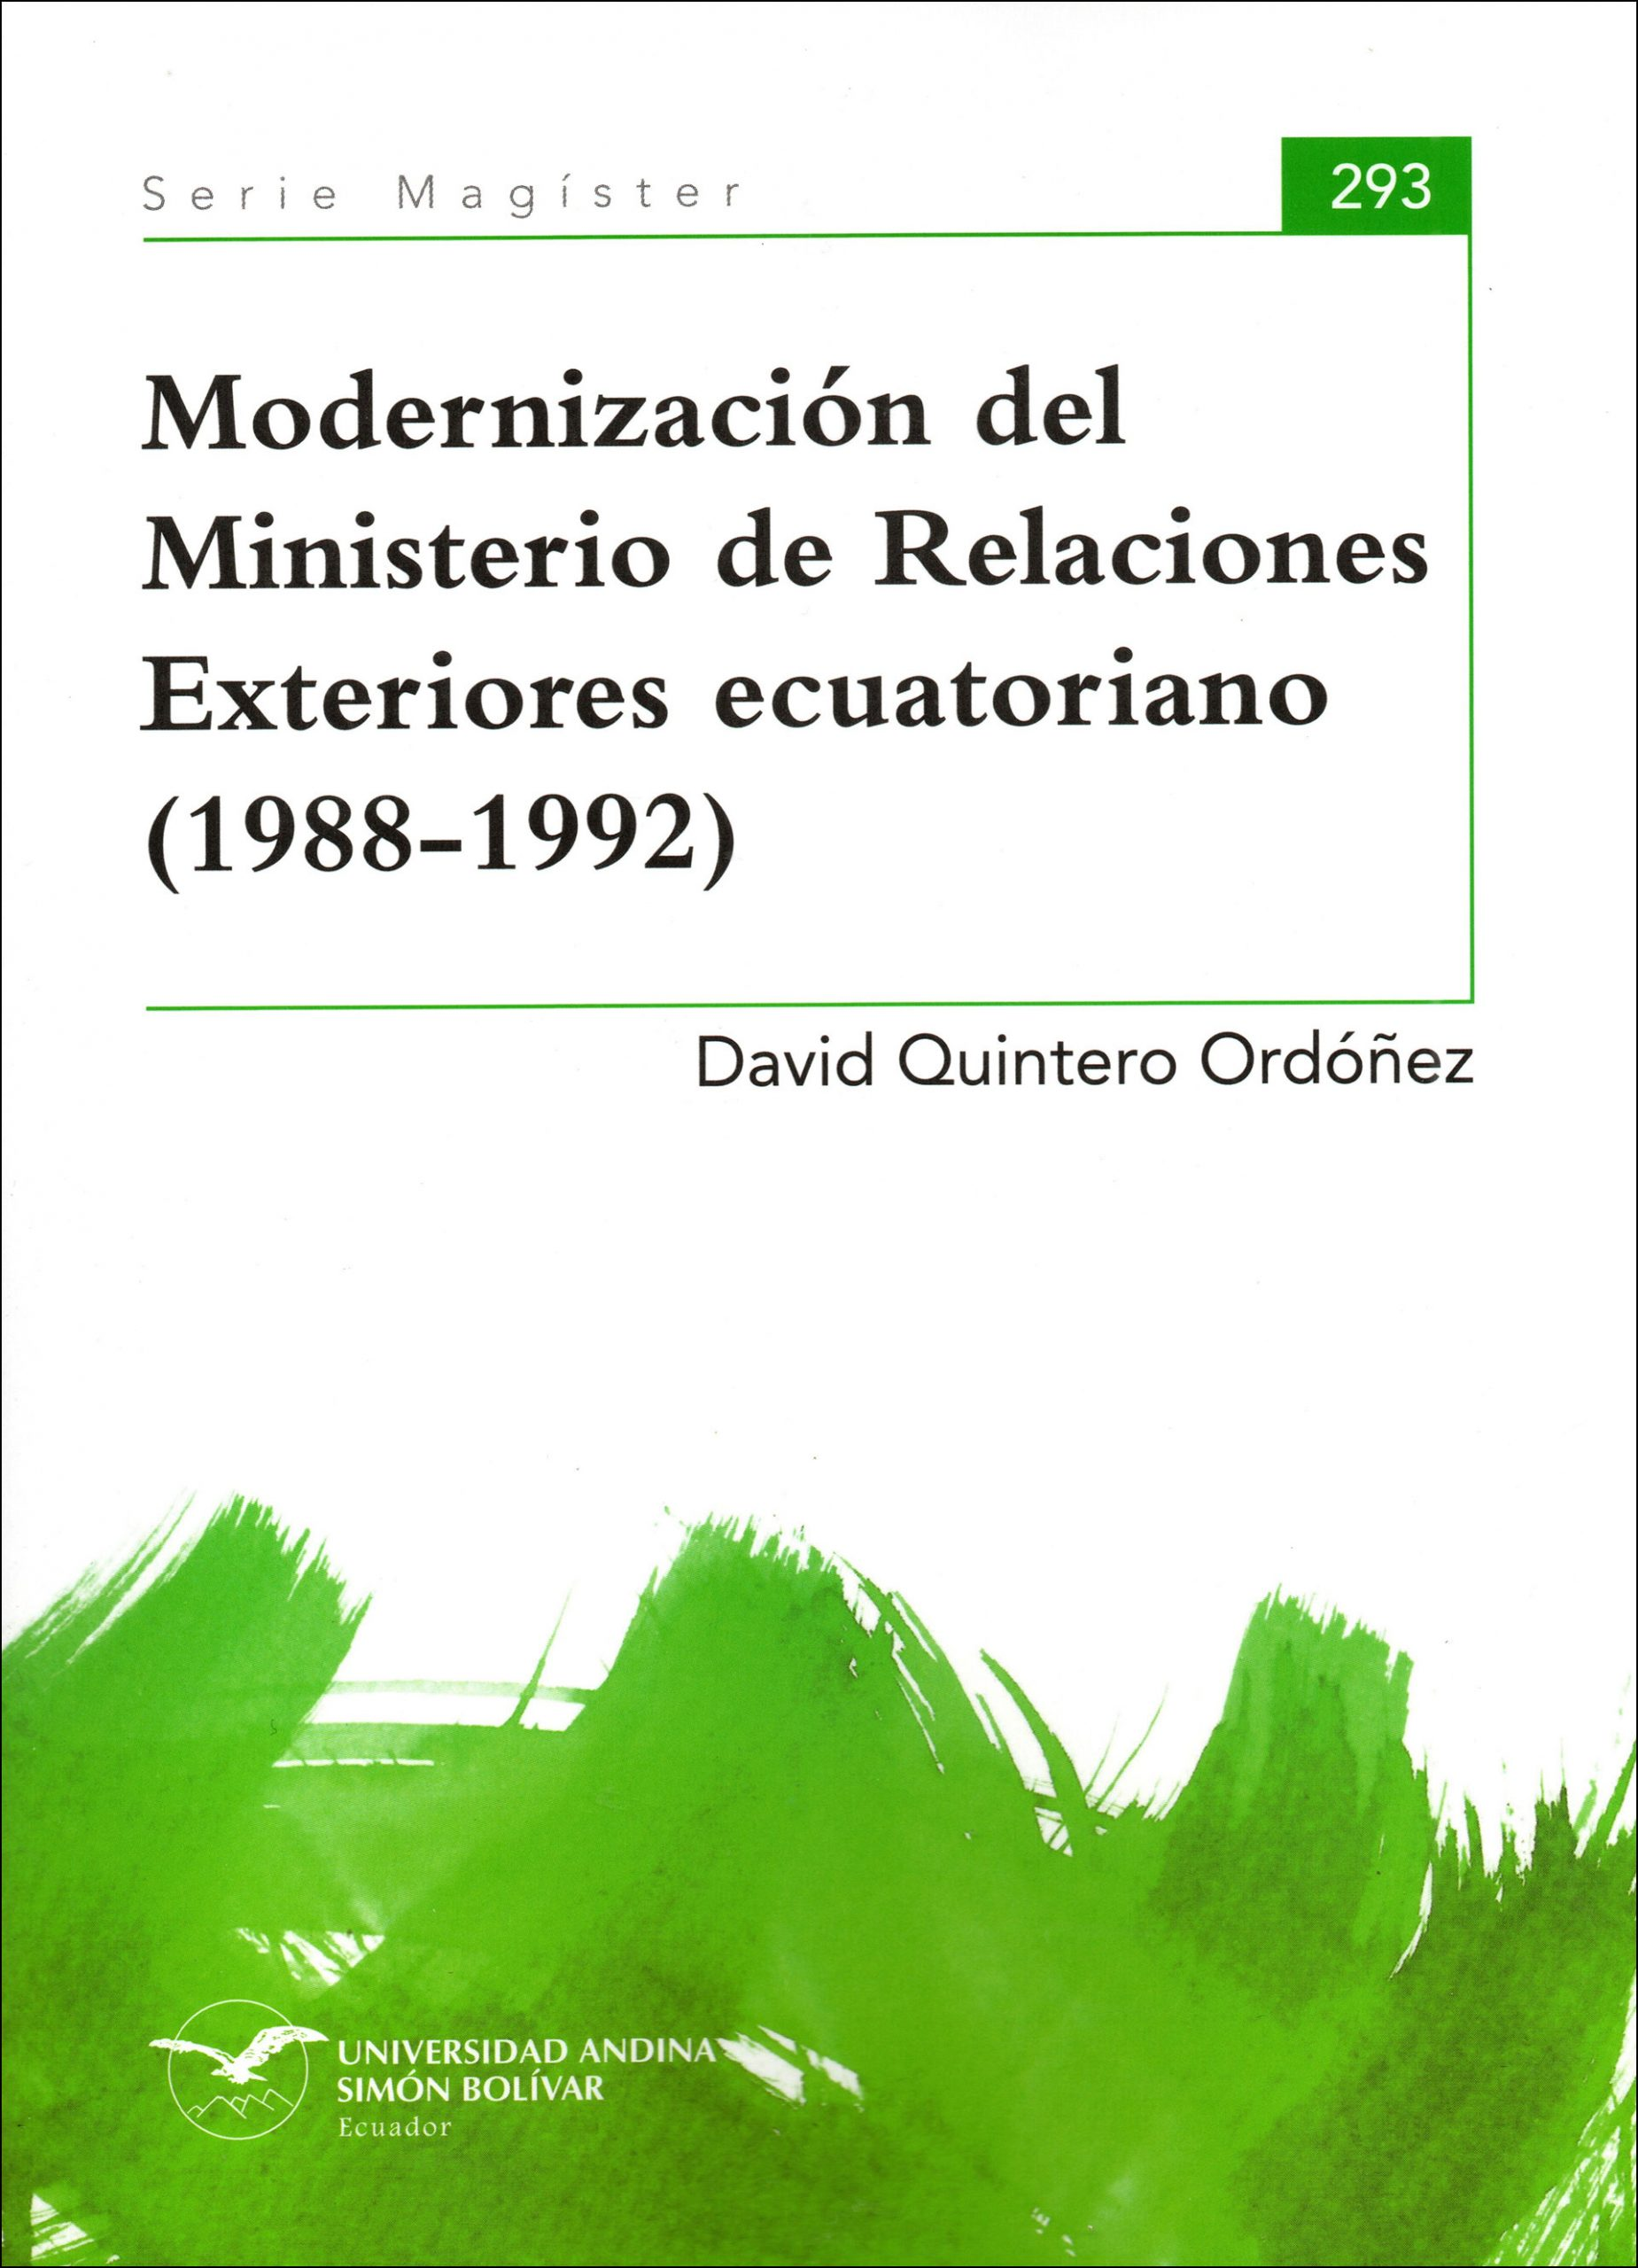 Modernización del Ministerio de Relaciones Exteriores ecuatoriano (1988-1992)